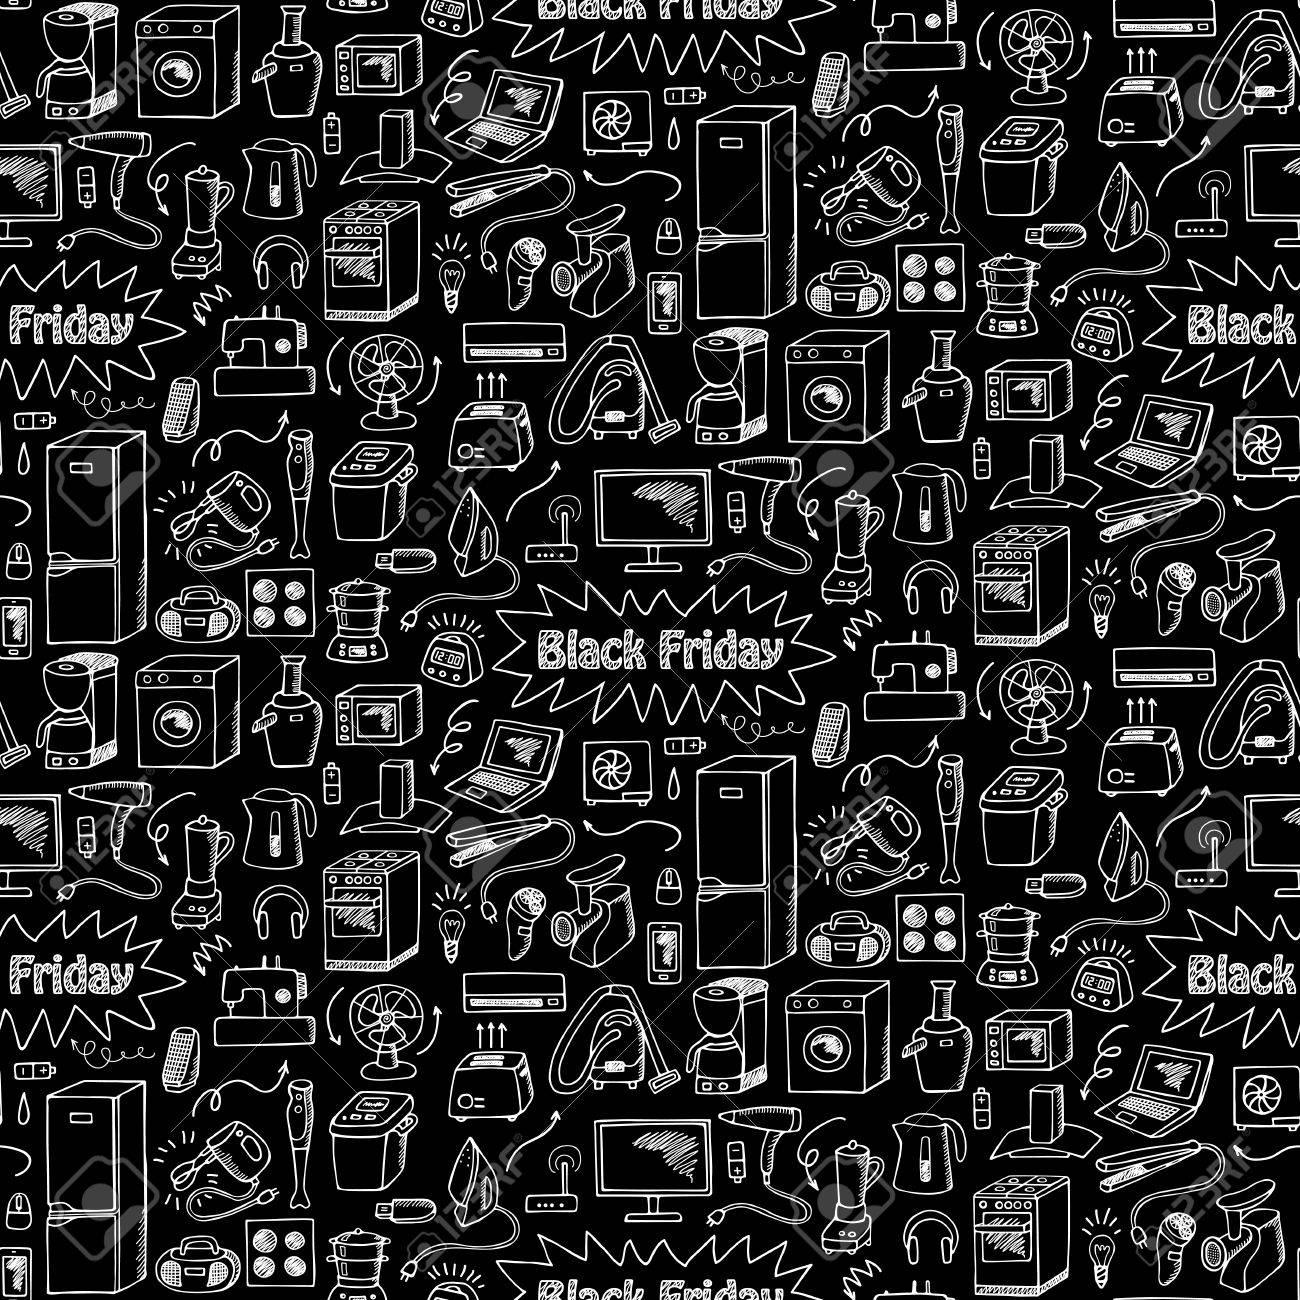 Black Friday Household Appliances Hand Drawn Seamless Pattern 1300x1300